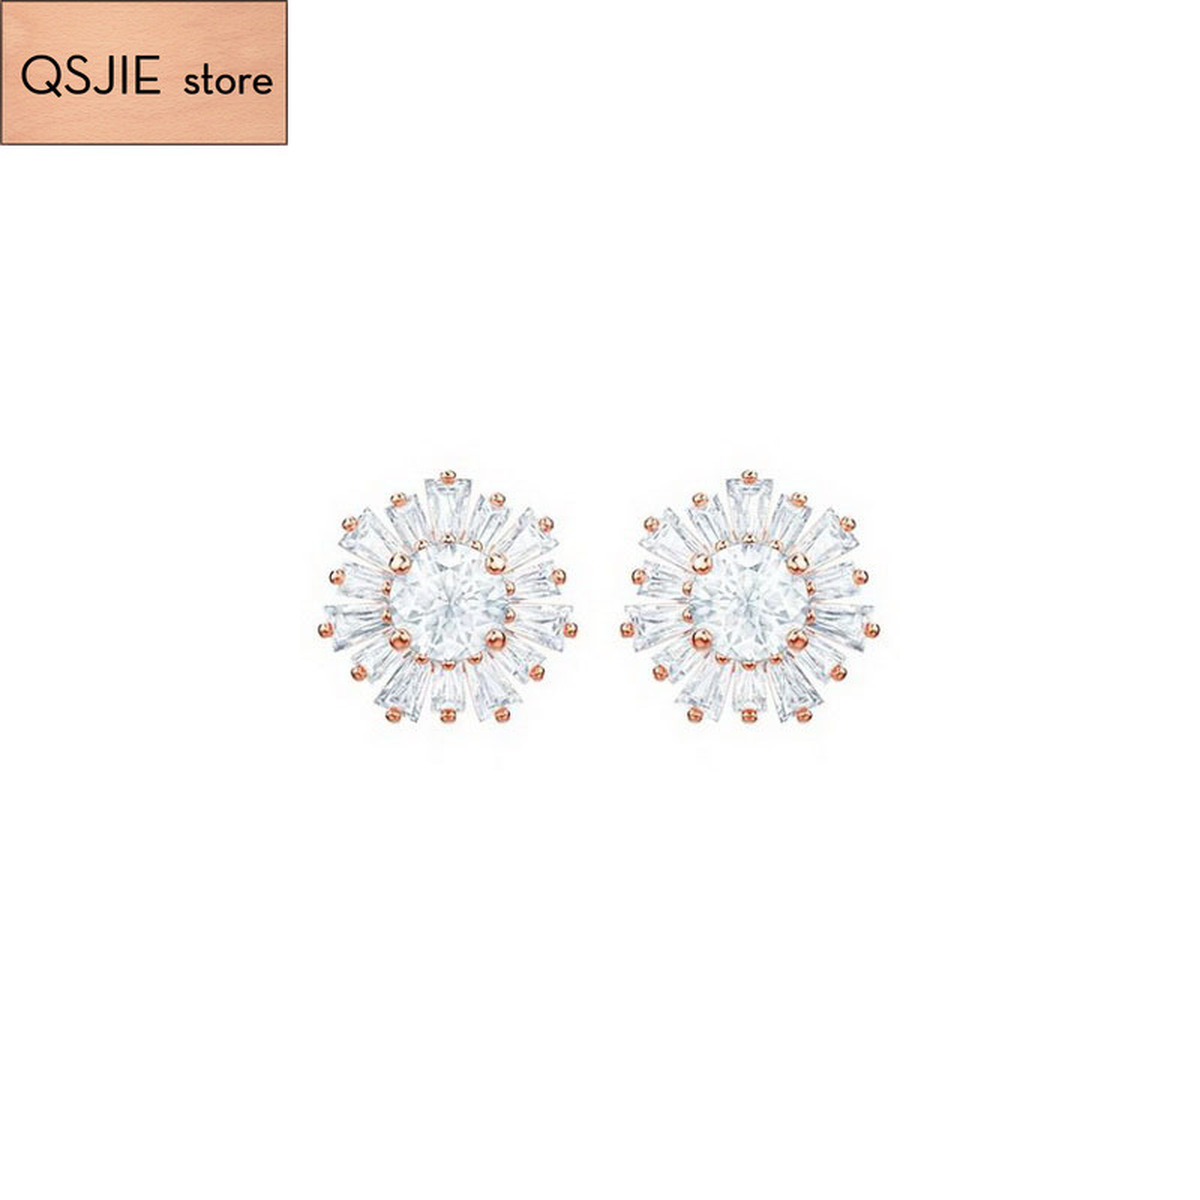 QSJIE High Quality Swa Original Jewelry Chamomile Earrings Glamorous fashion jewelry